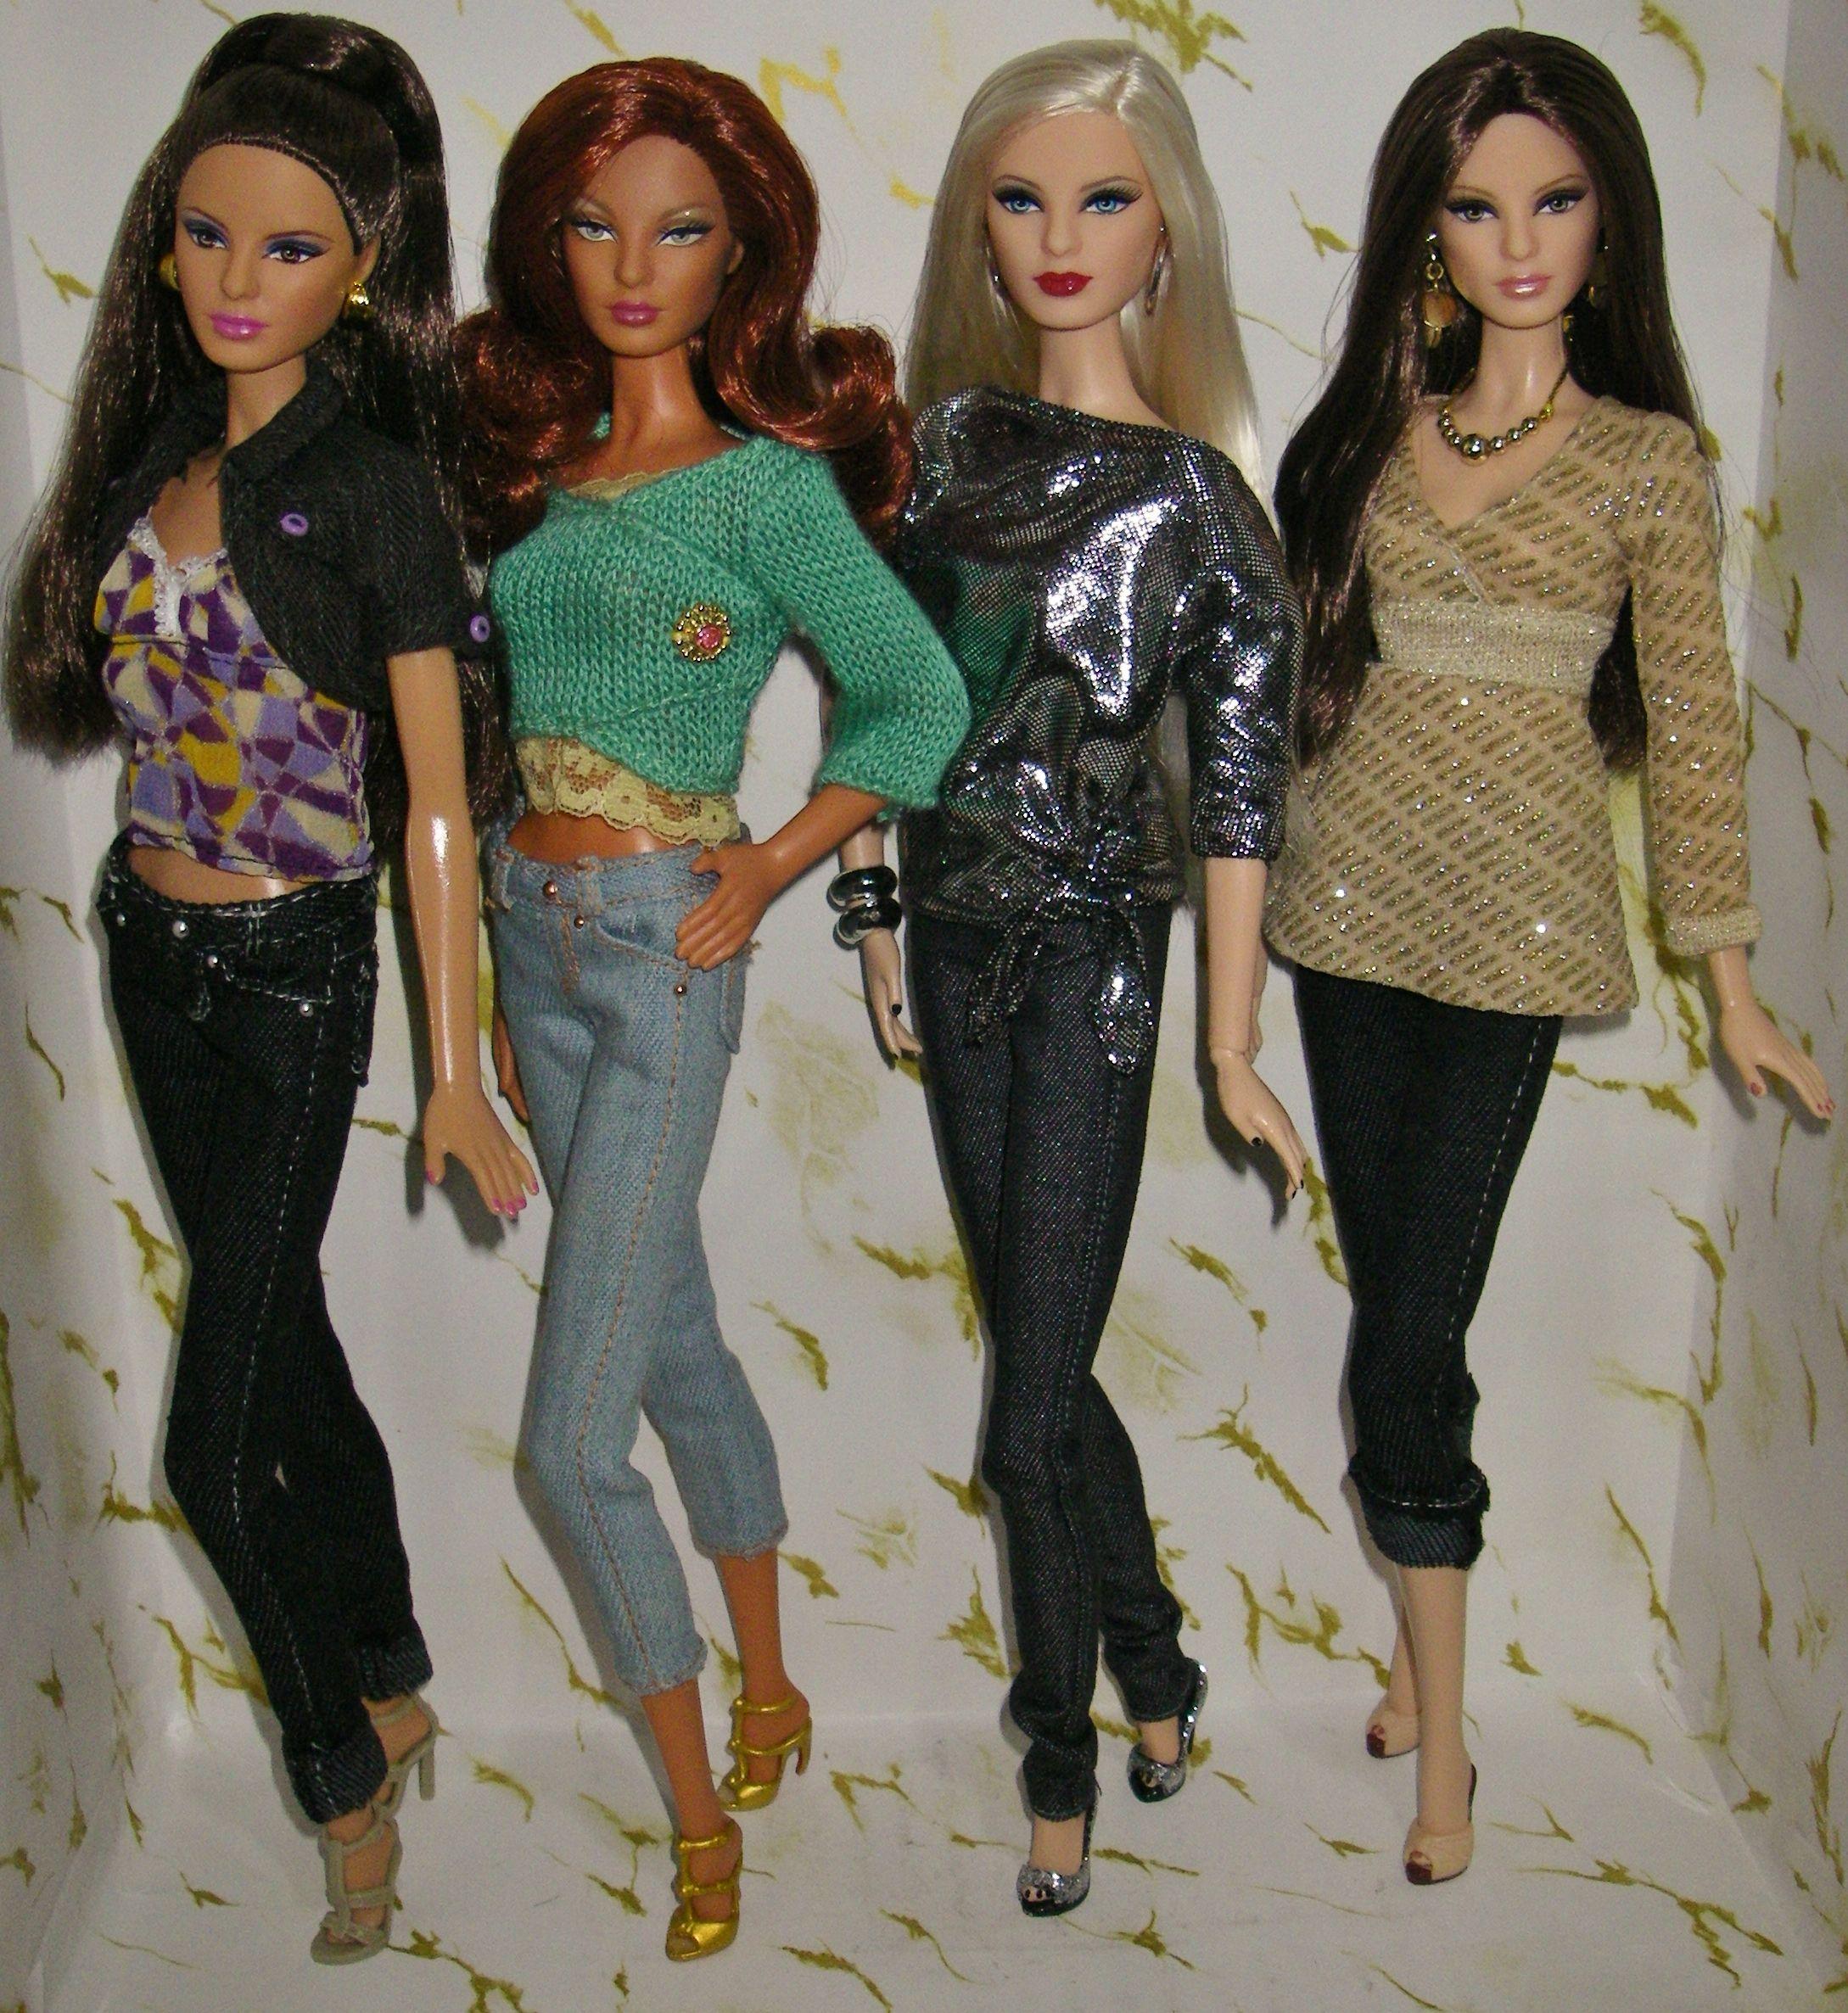 Barbie Face Louboutin Ropa Para Barbie Munecas Barbie Ropa